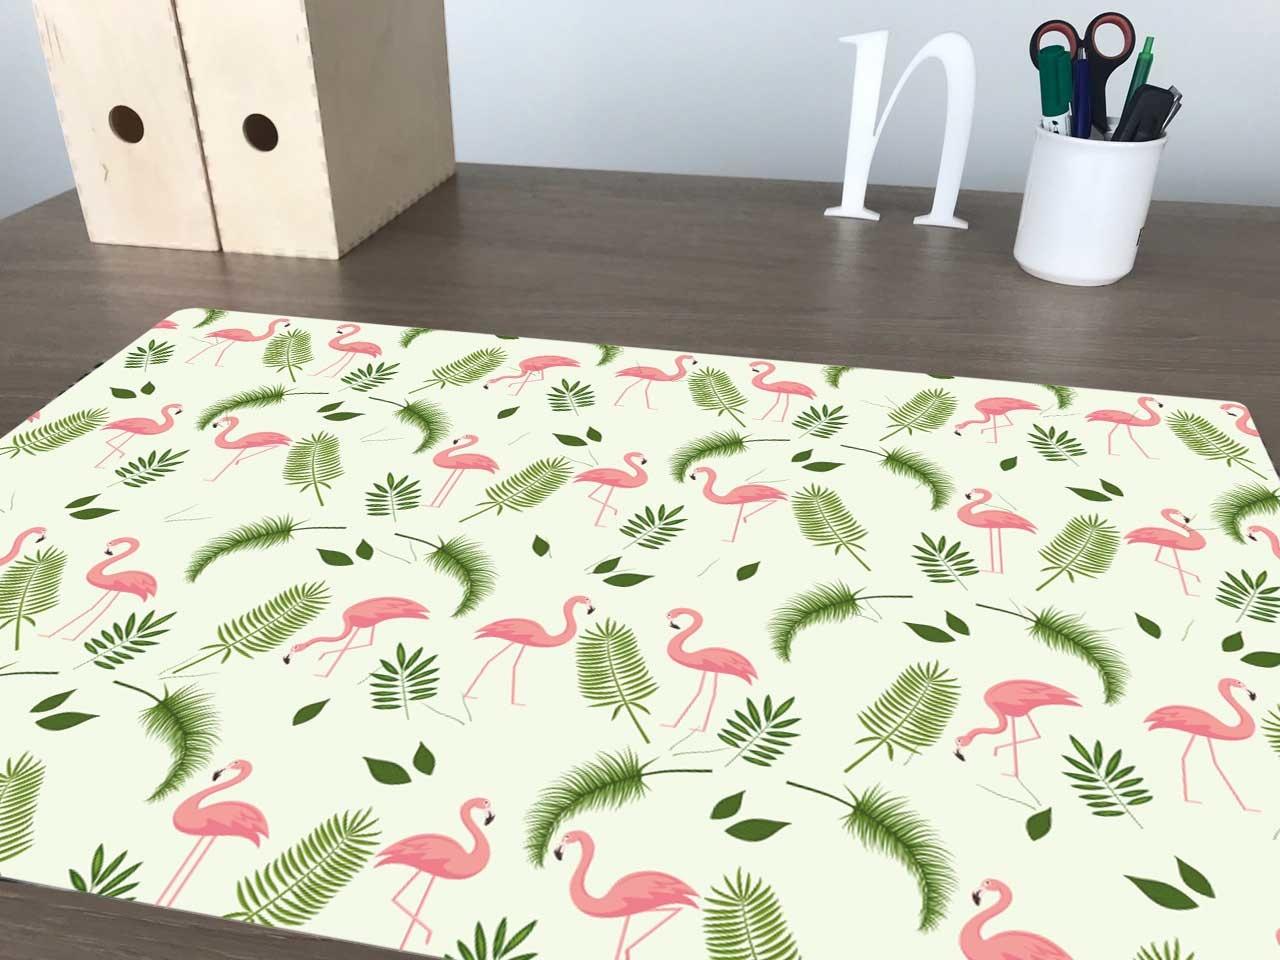 Bureau onderlegger met flamingo patroon